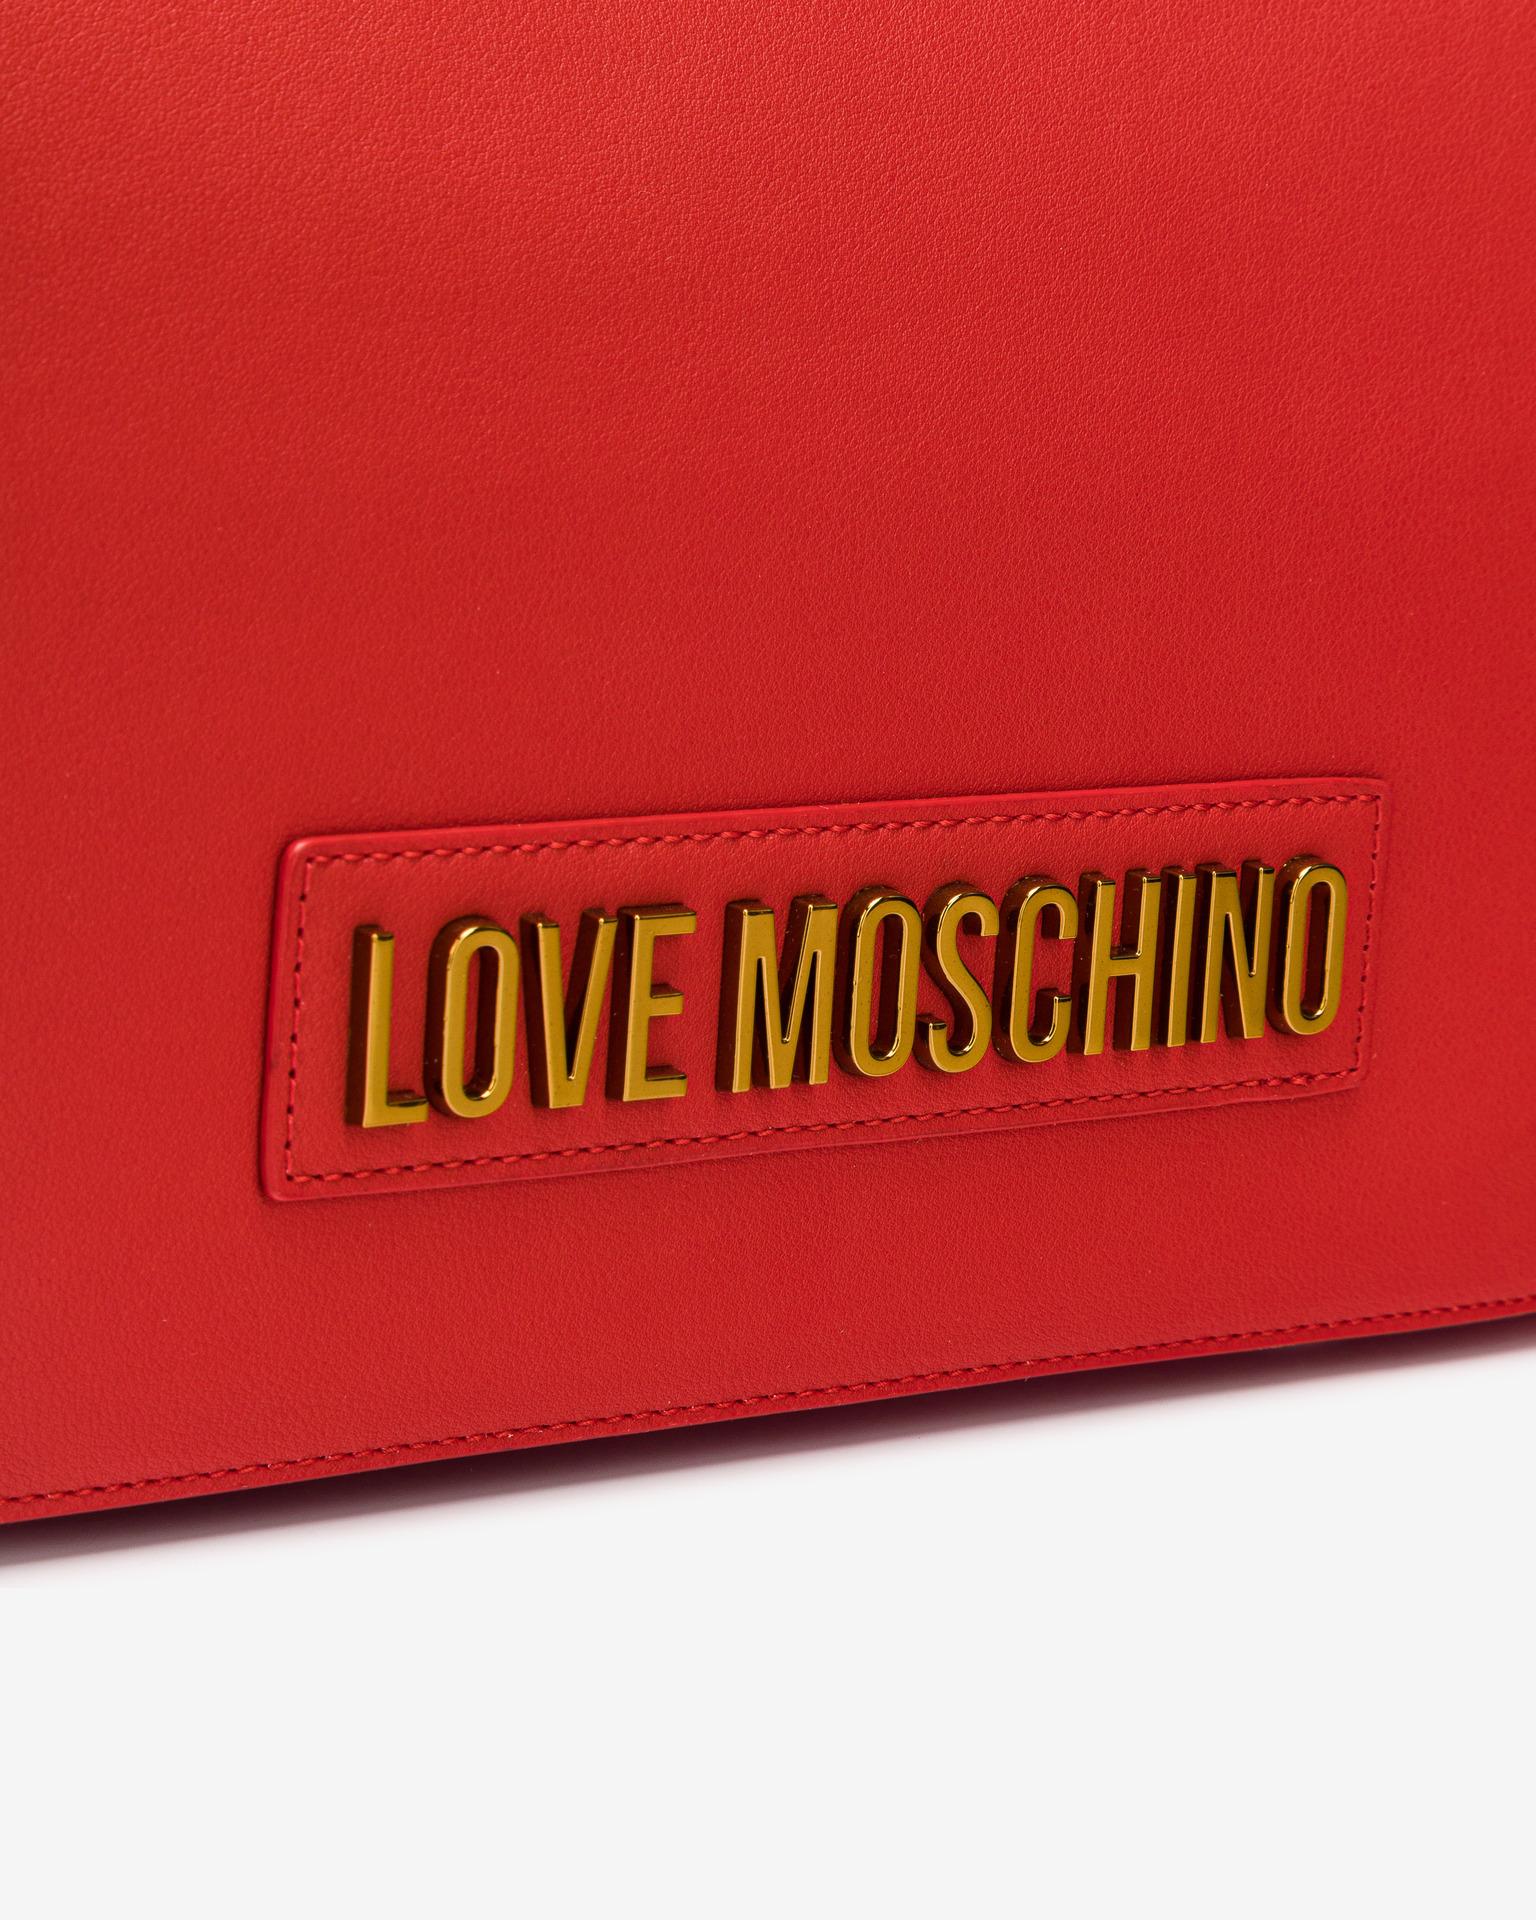 Love Moschino red handbag